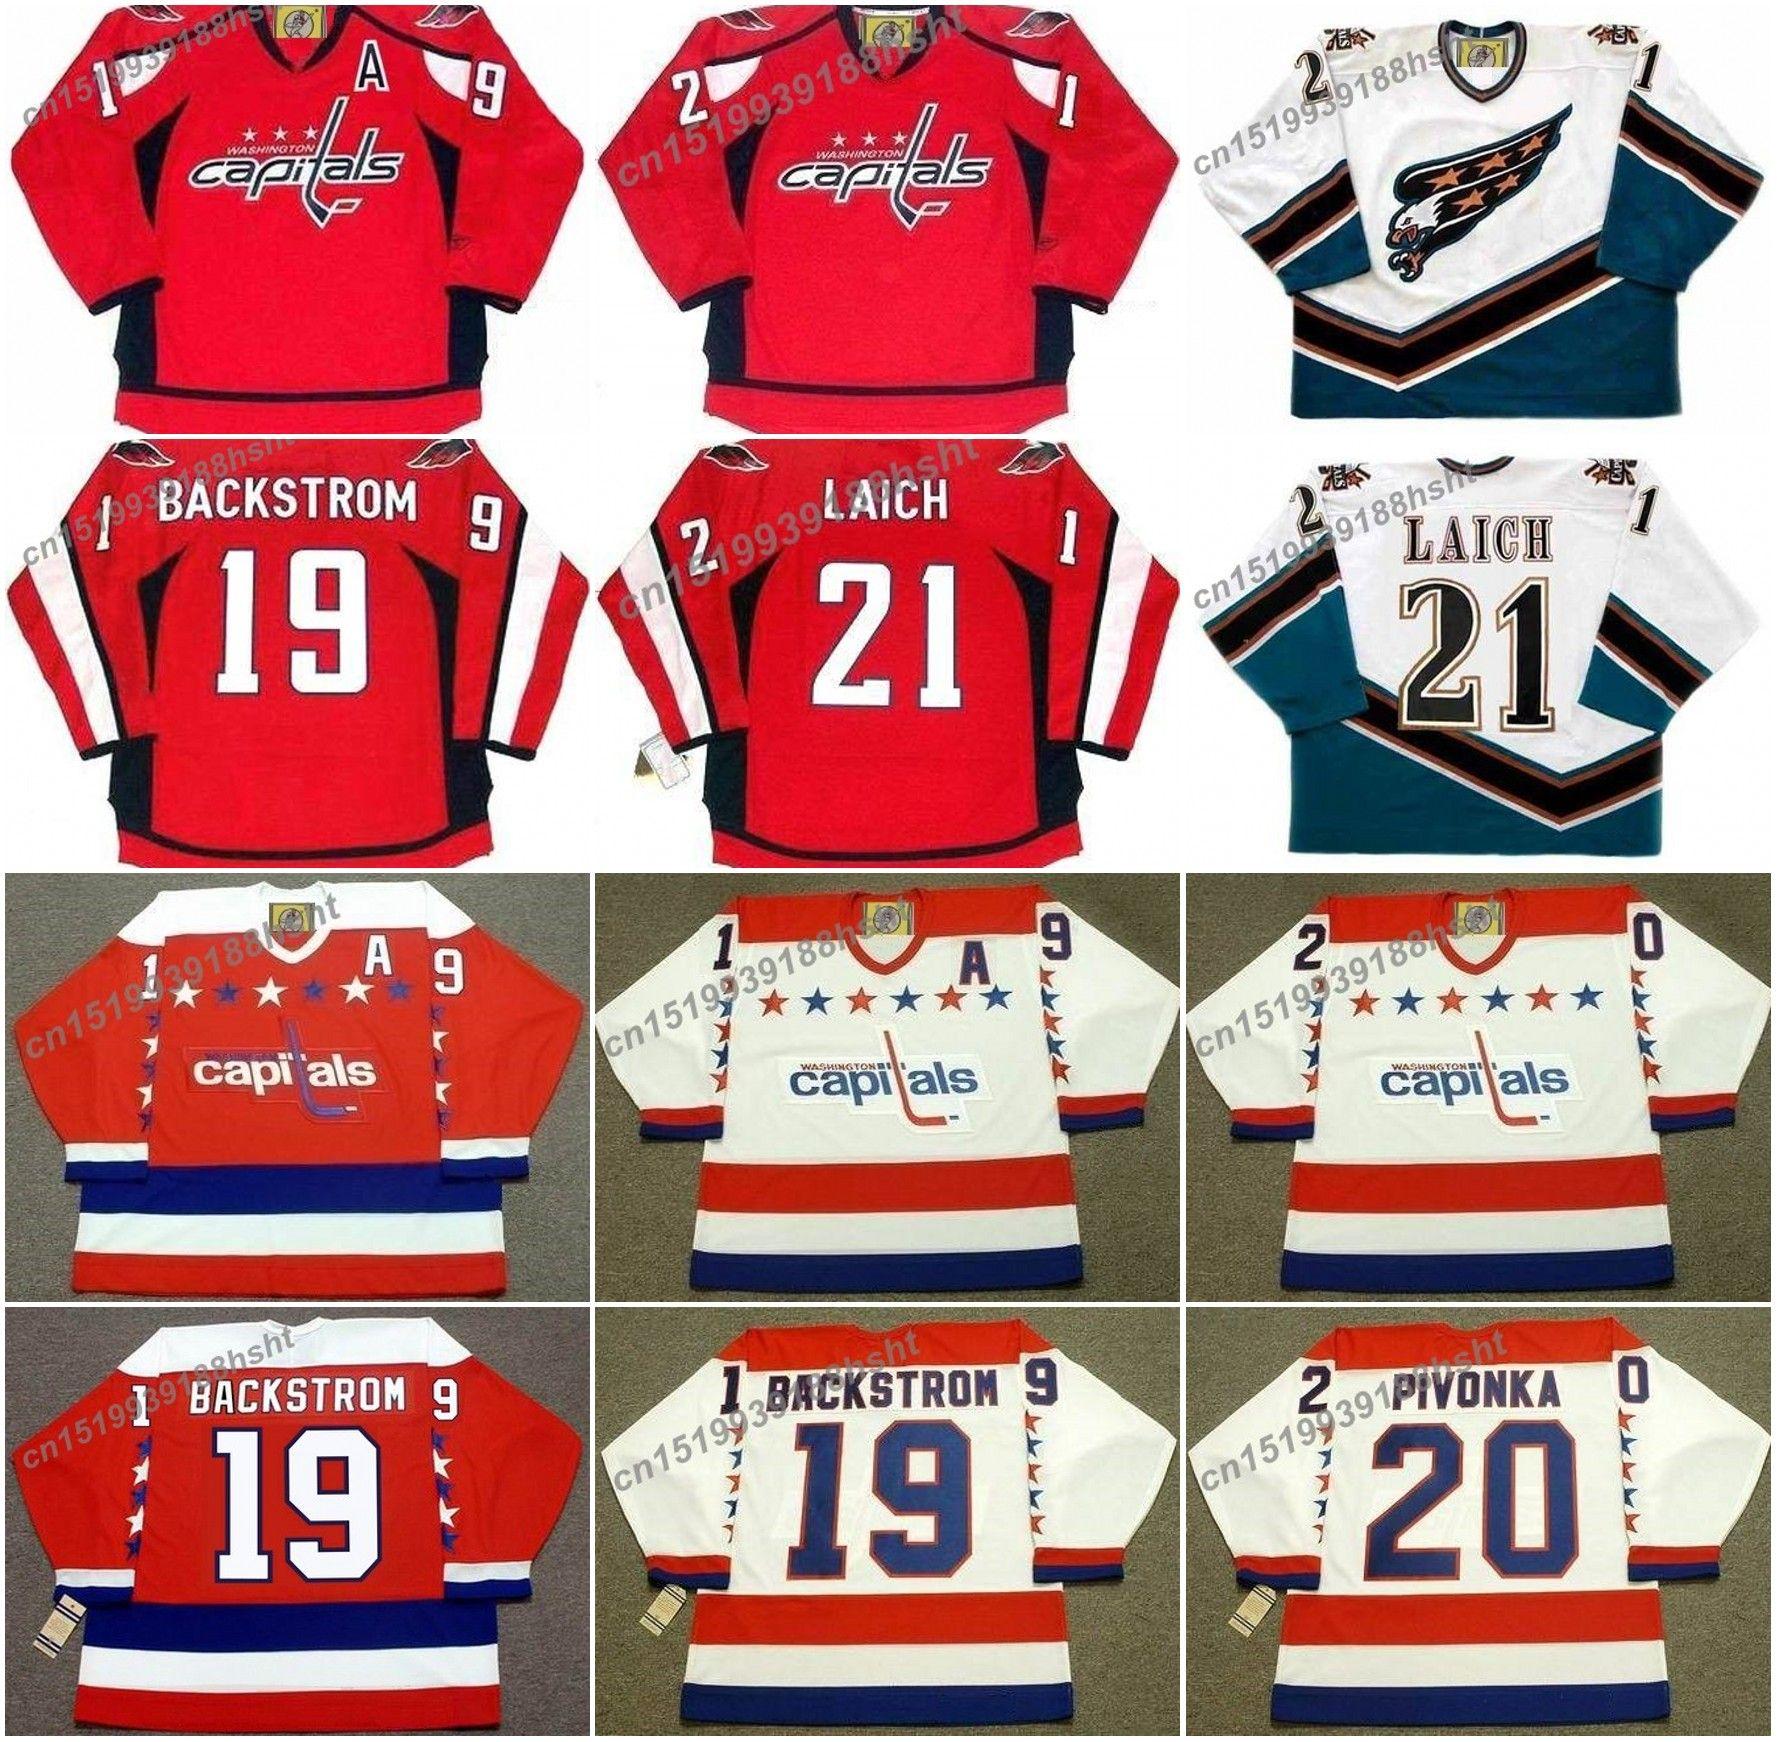 12b9b6c187d ... clearance 2018 19 nicklas backstrom 20 michal pivonka 21 brooks laich  washington capitals 2010 jersey from